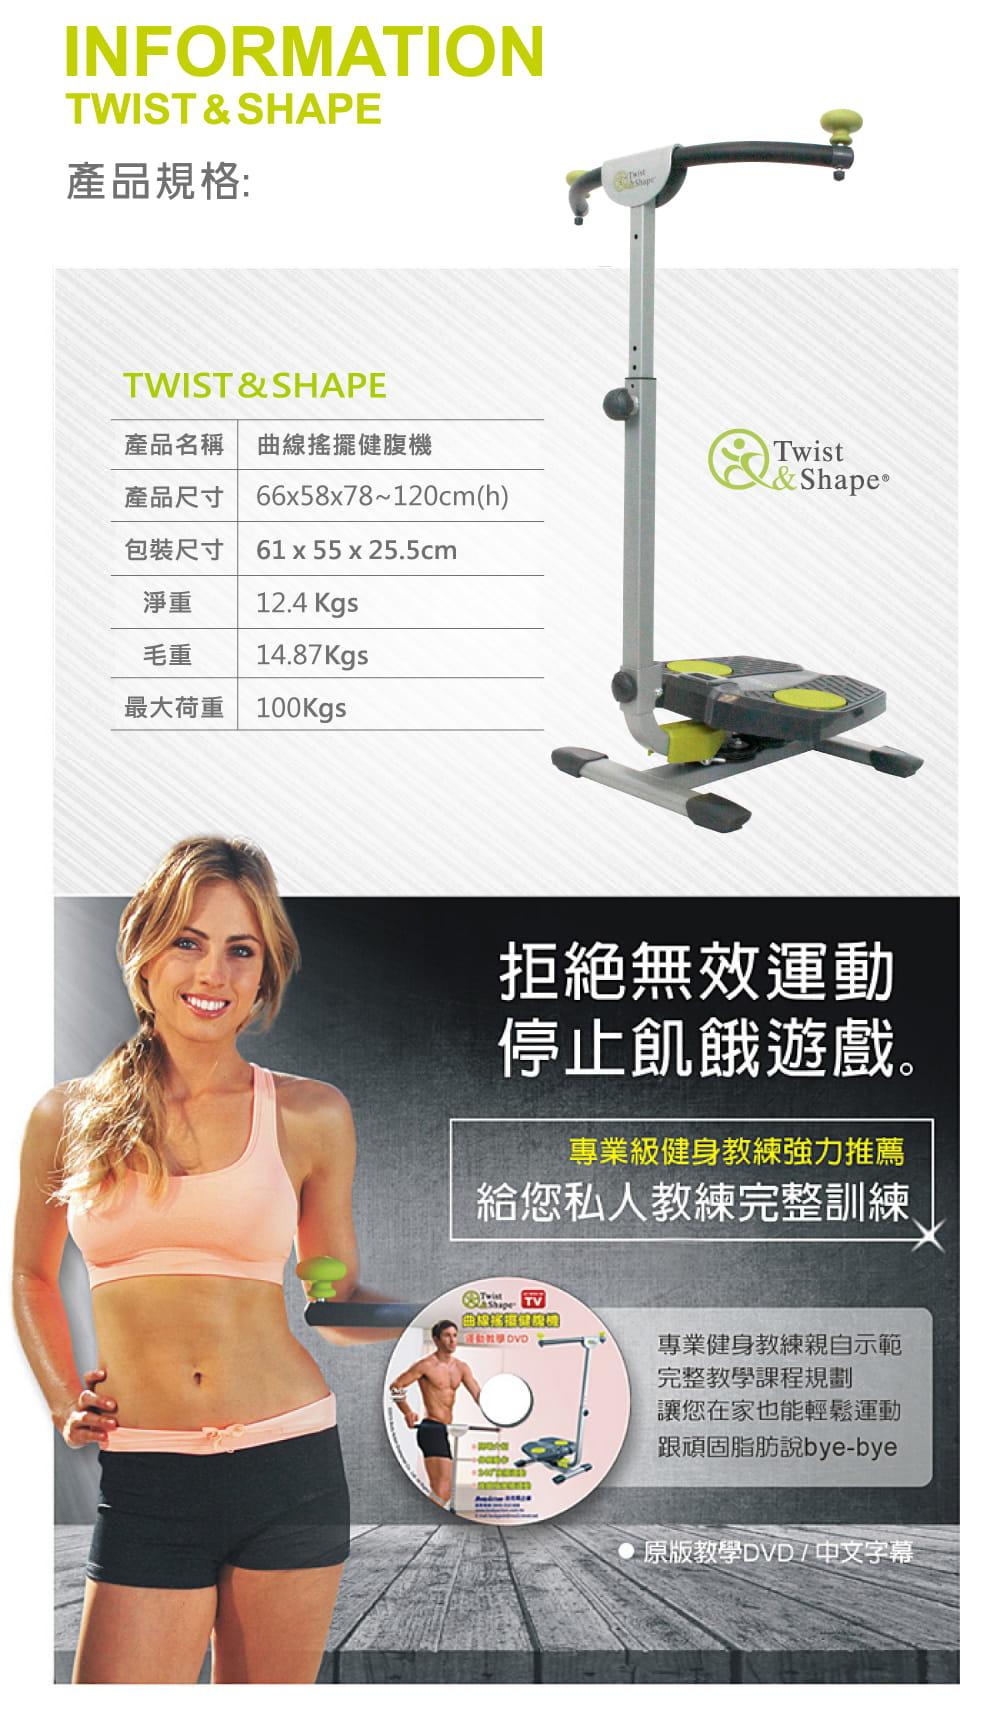 Twist&Shape曲線搖擺健腹機 折疊版 保固一年  贈綠色有氧瑜珈墊 19